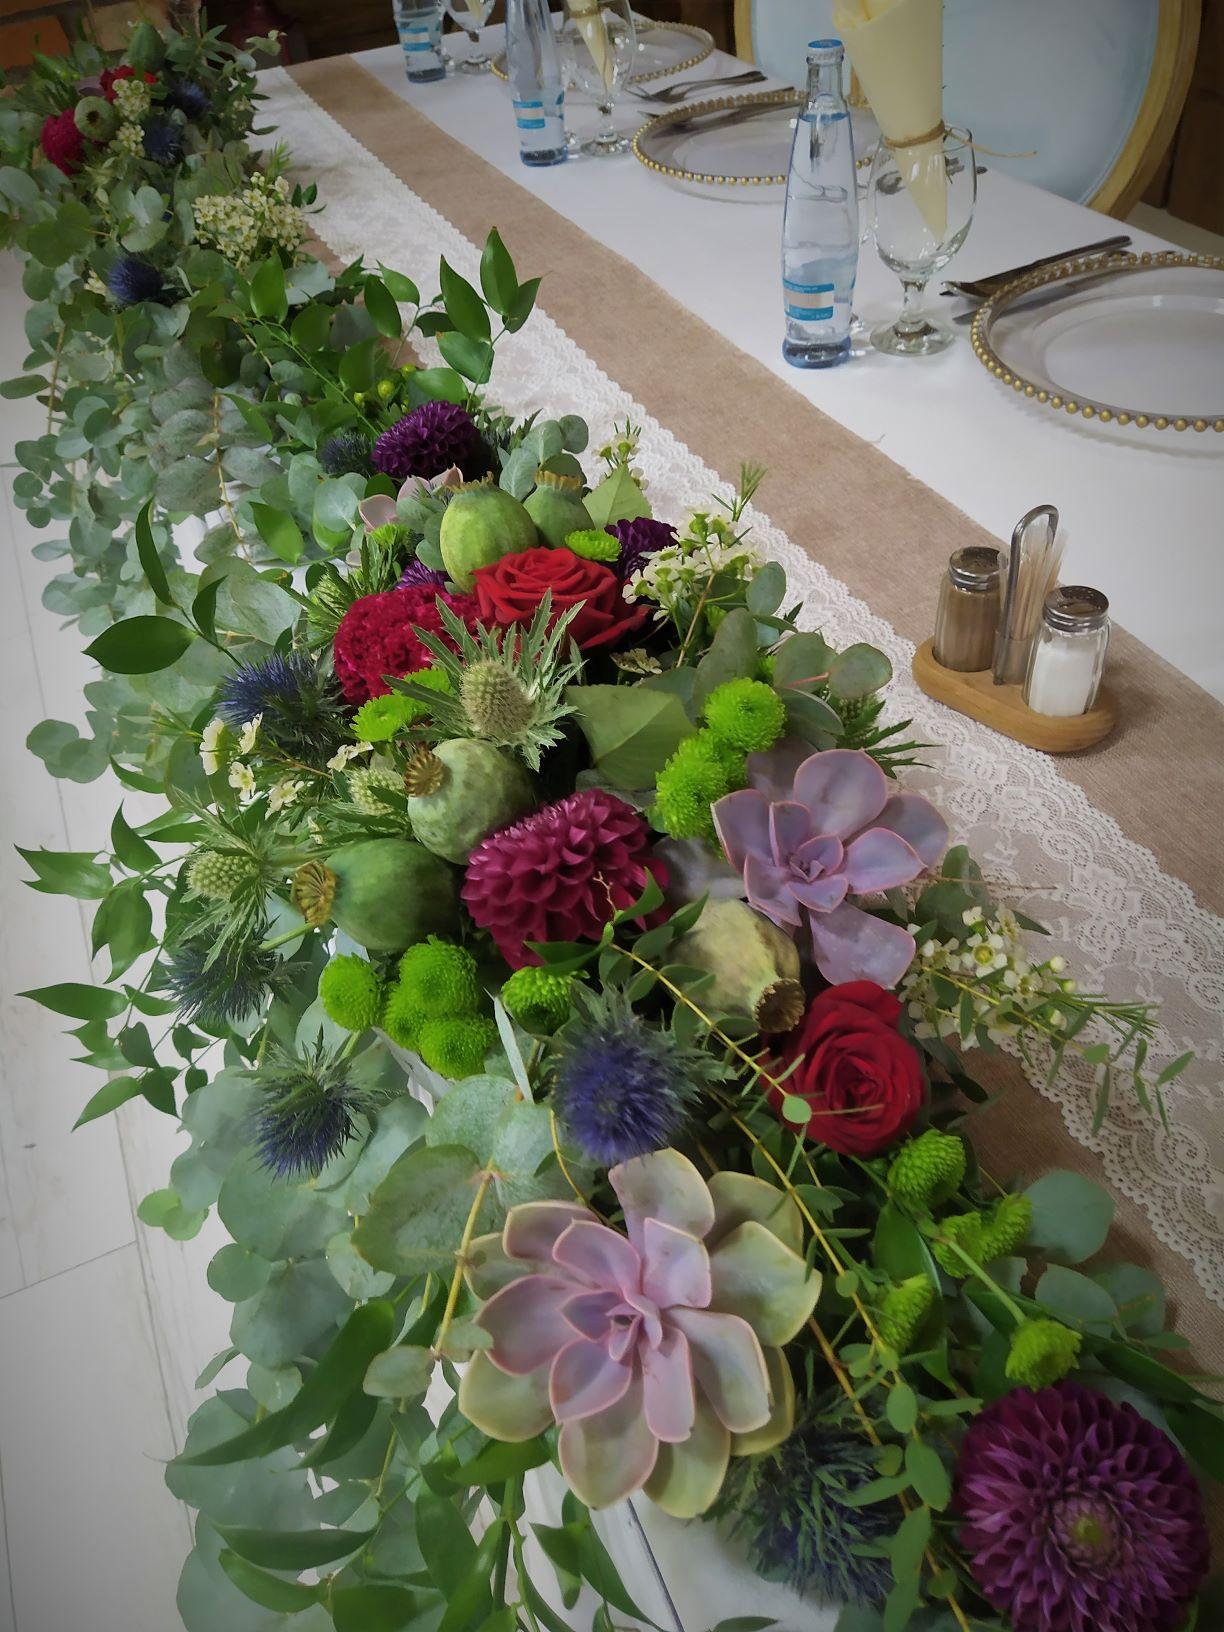 kvetinova dekoracia na kraj stola po celej dlžke zelono bordova ruže, eukaliptus,makovice, bodliaky